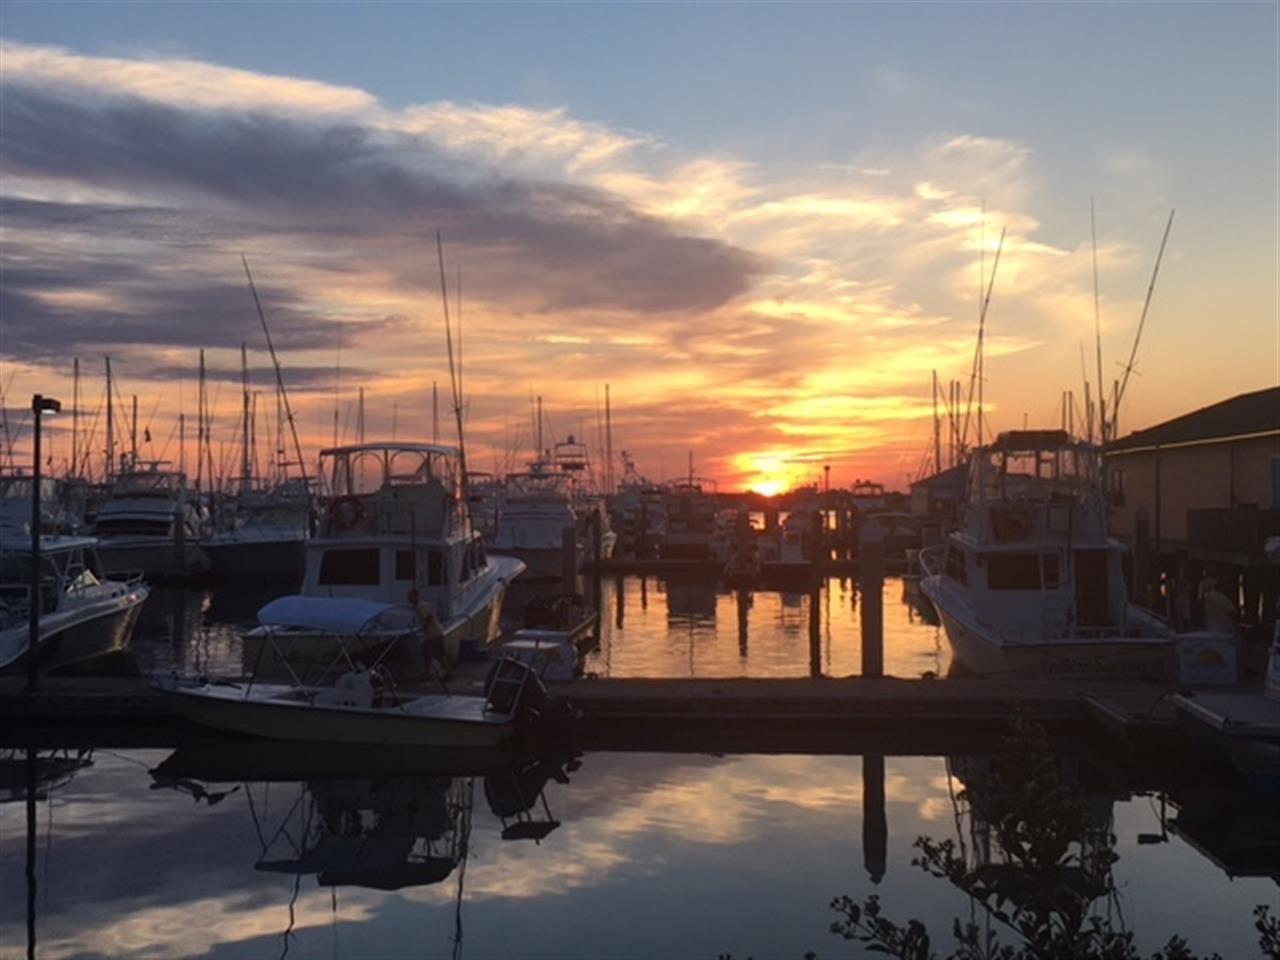 #StAugustineFLorida #AtlanticOcean #Fishingboats #Sunrise